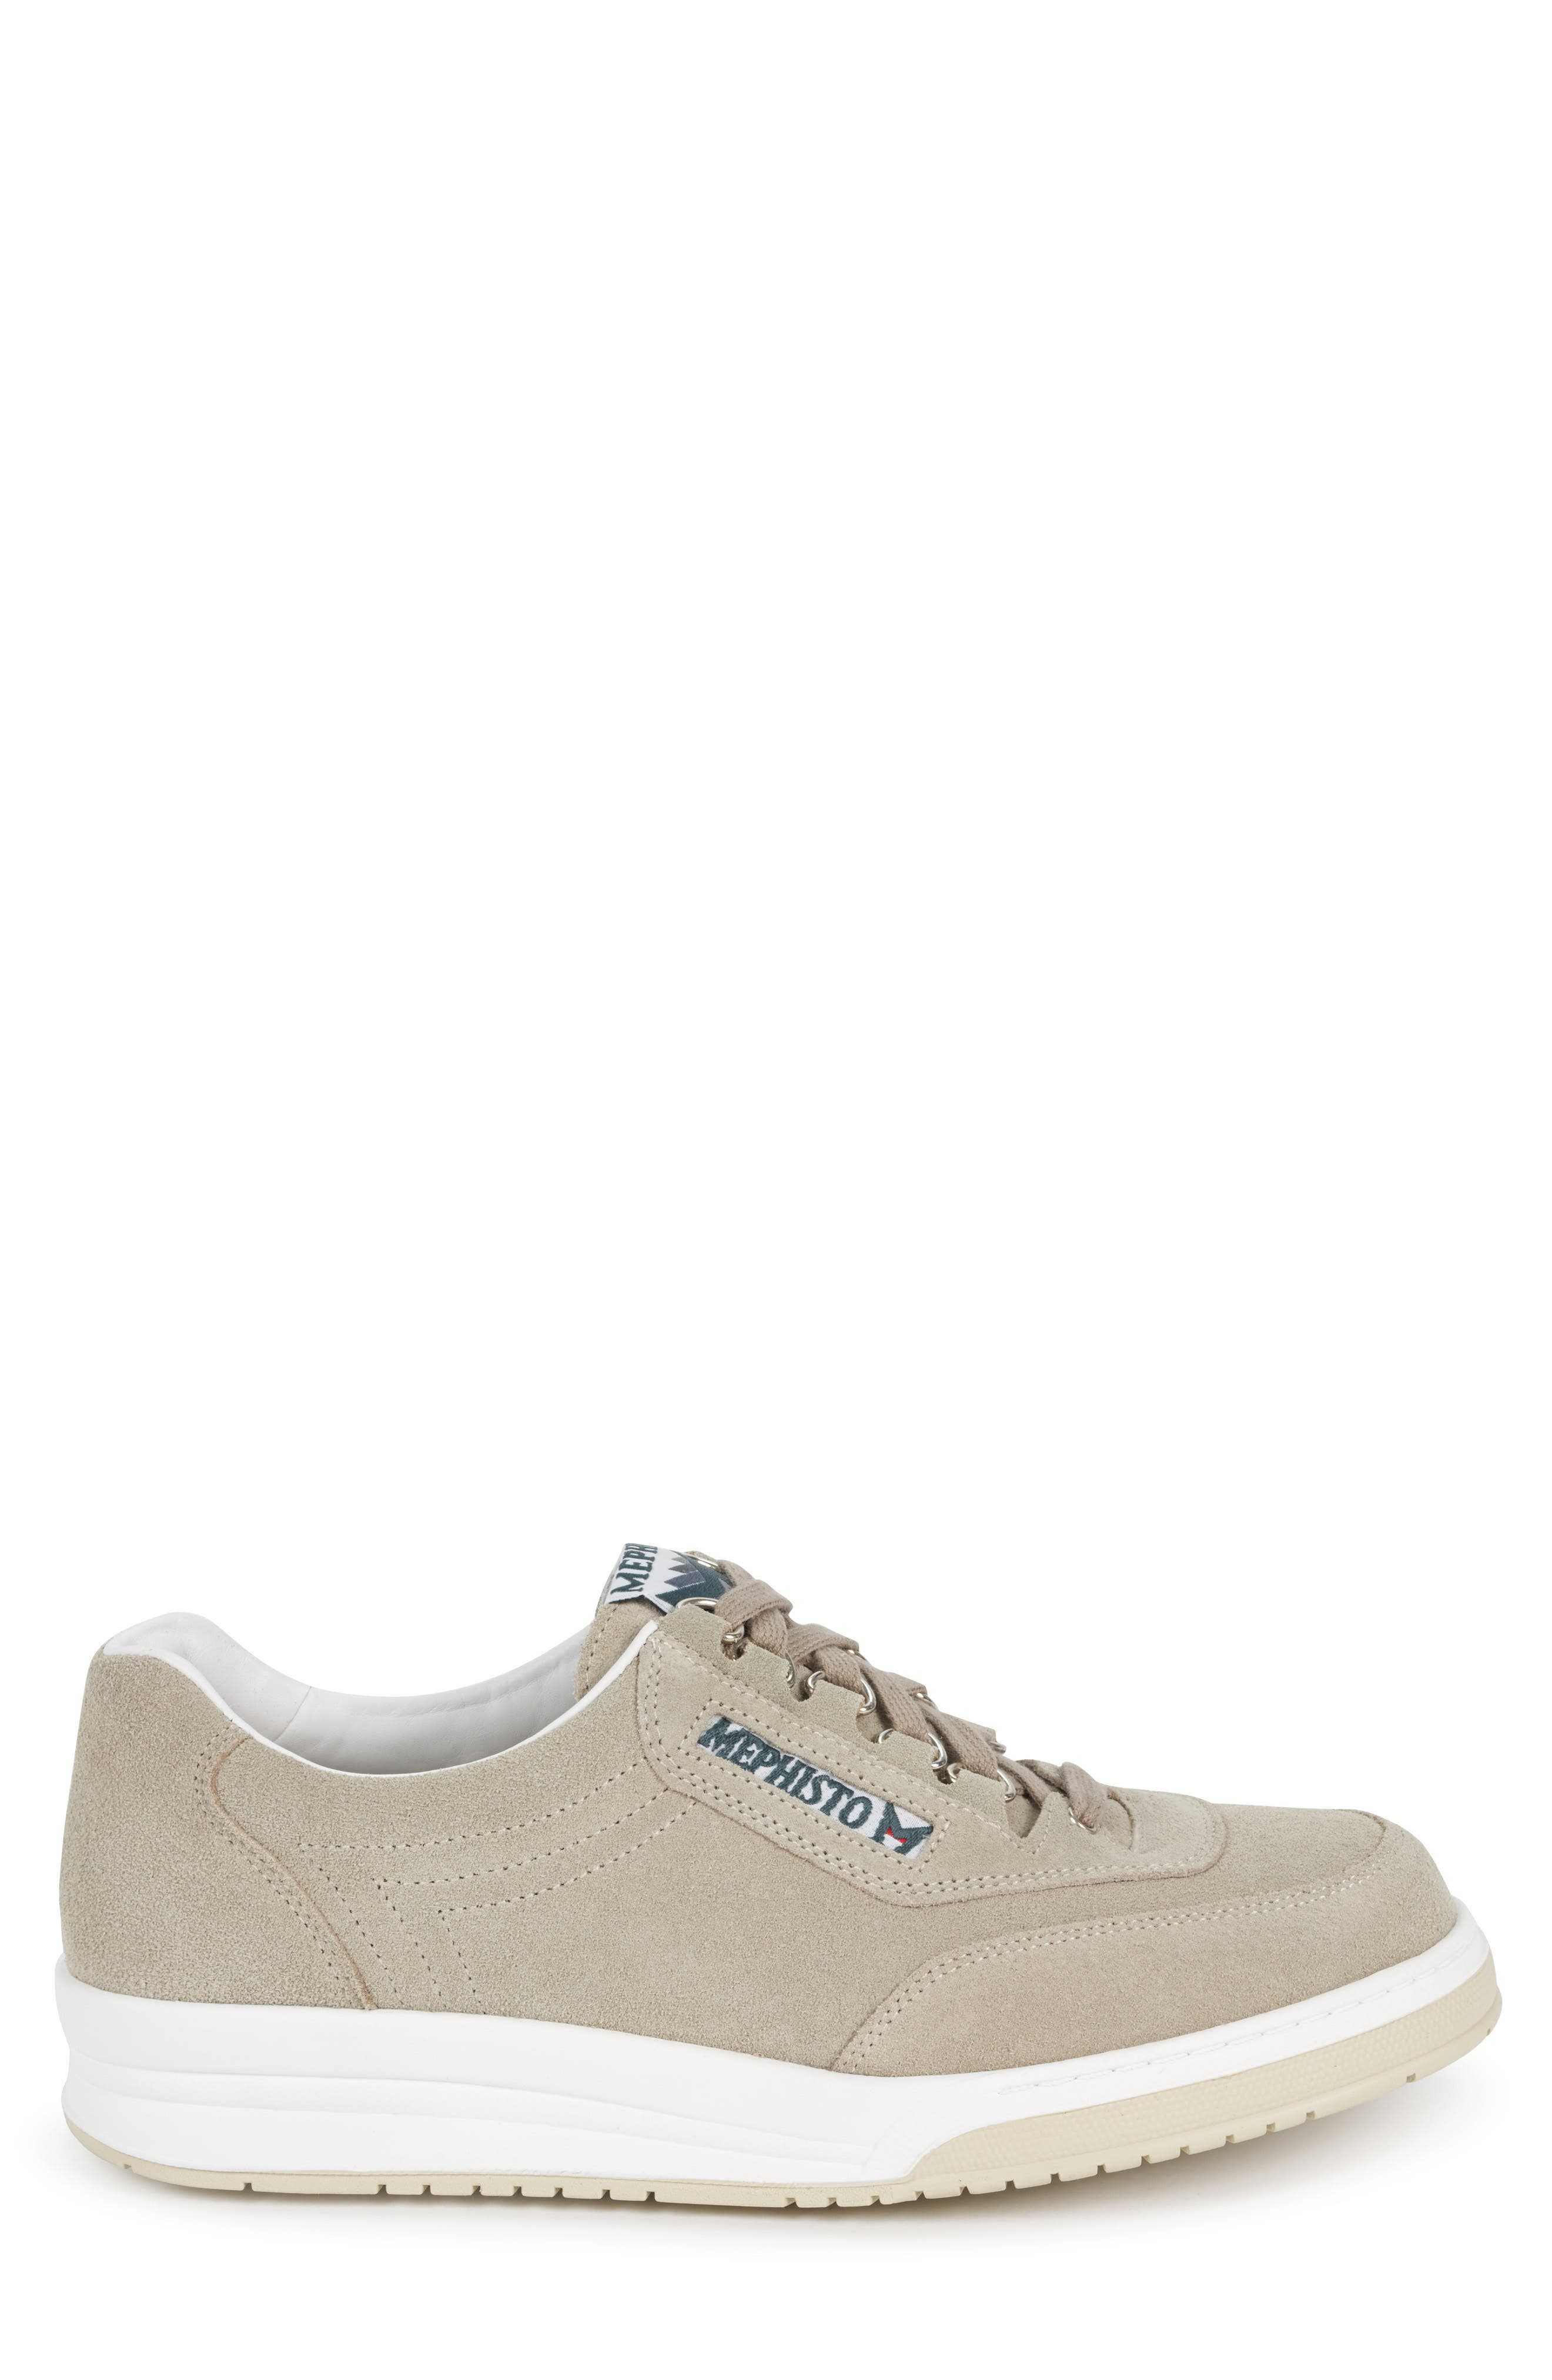 MEPHISTO, 'Match' Walking Shoe, Alternate thumbnail 3, color, CAMEL